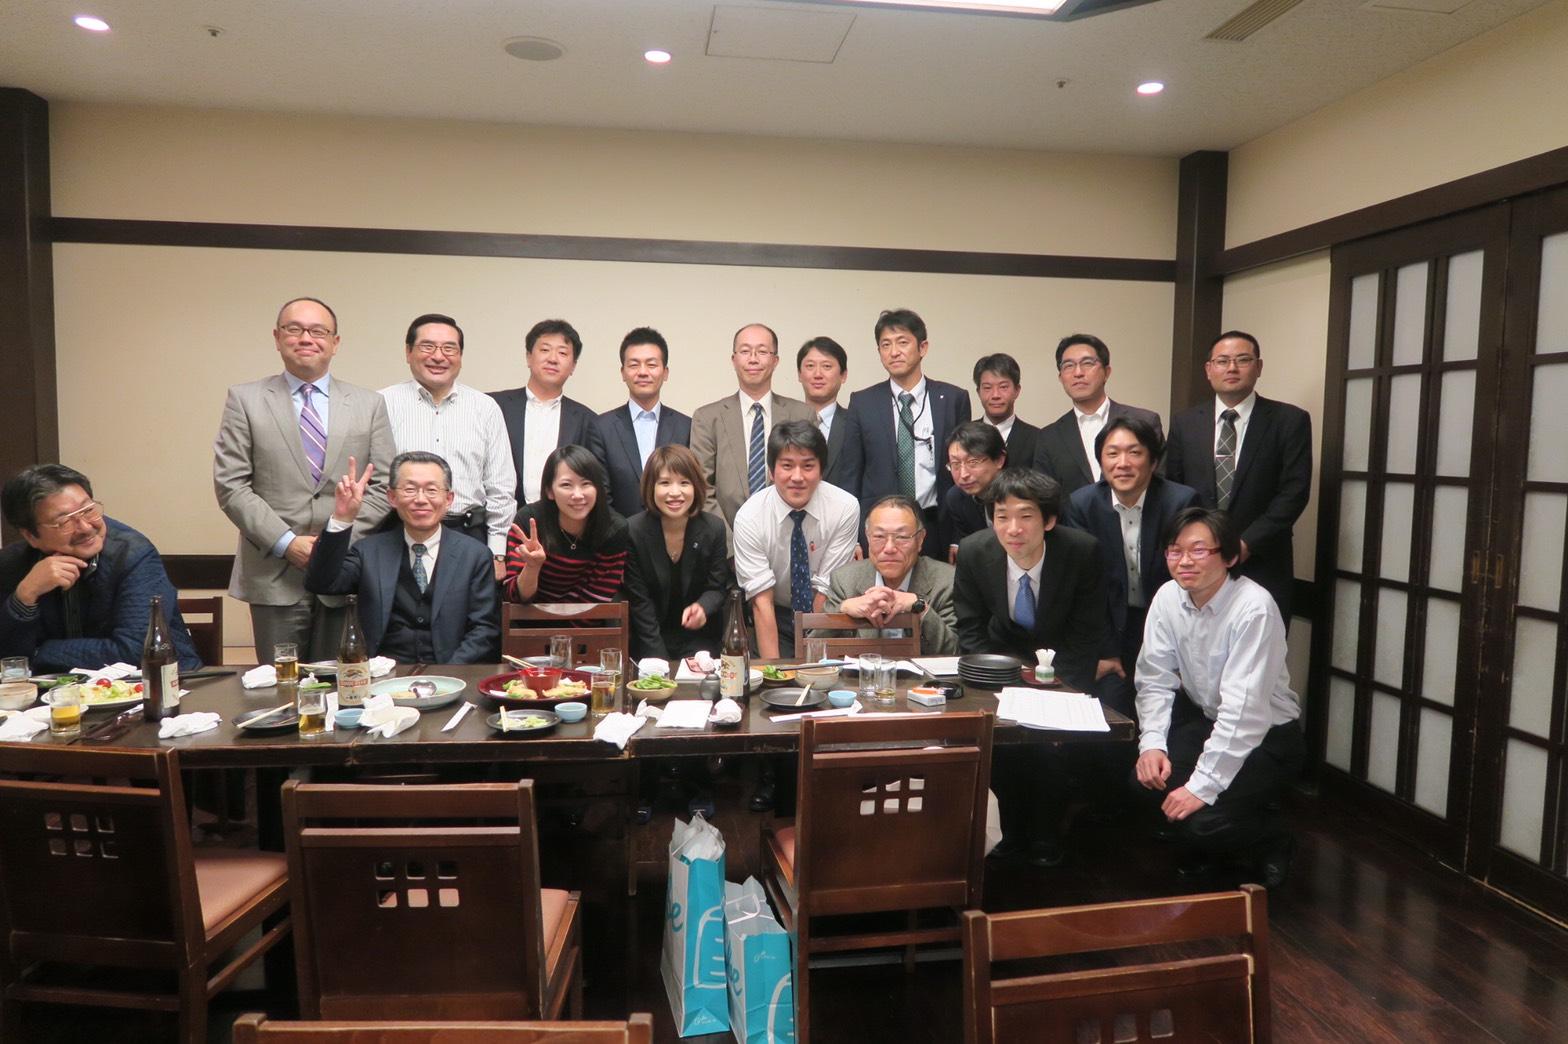 日本食品機械工業会様ボウリング大会☆_d0156990_185440.jpg